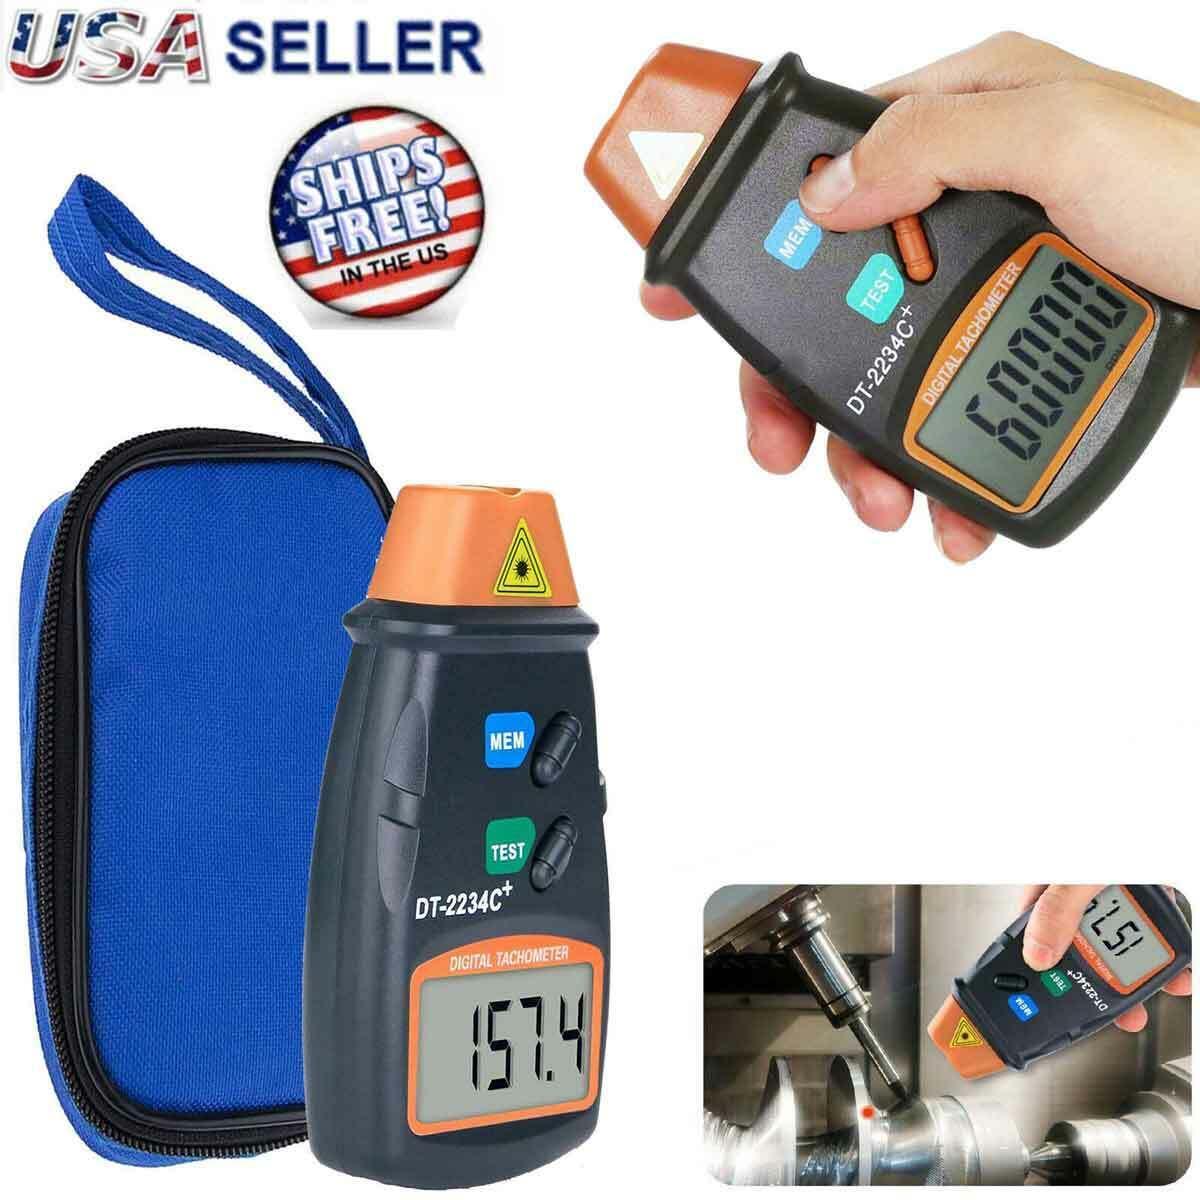 Digital Laser Tachometer Non-Contact Rpm Tach Tester Speed Gauge 2.5-99999RPM RY